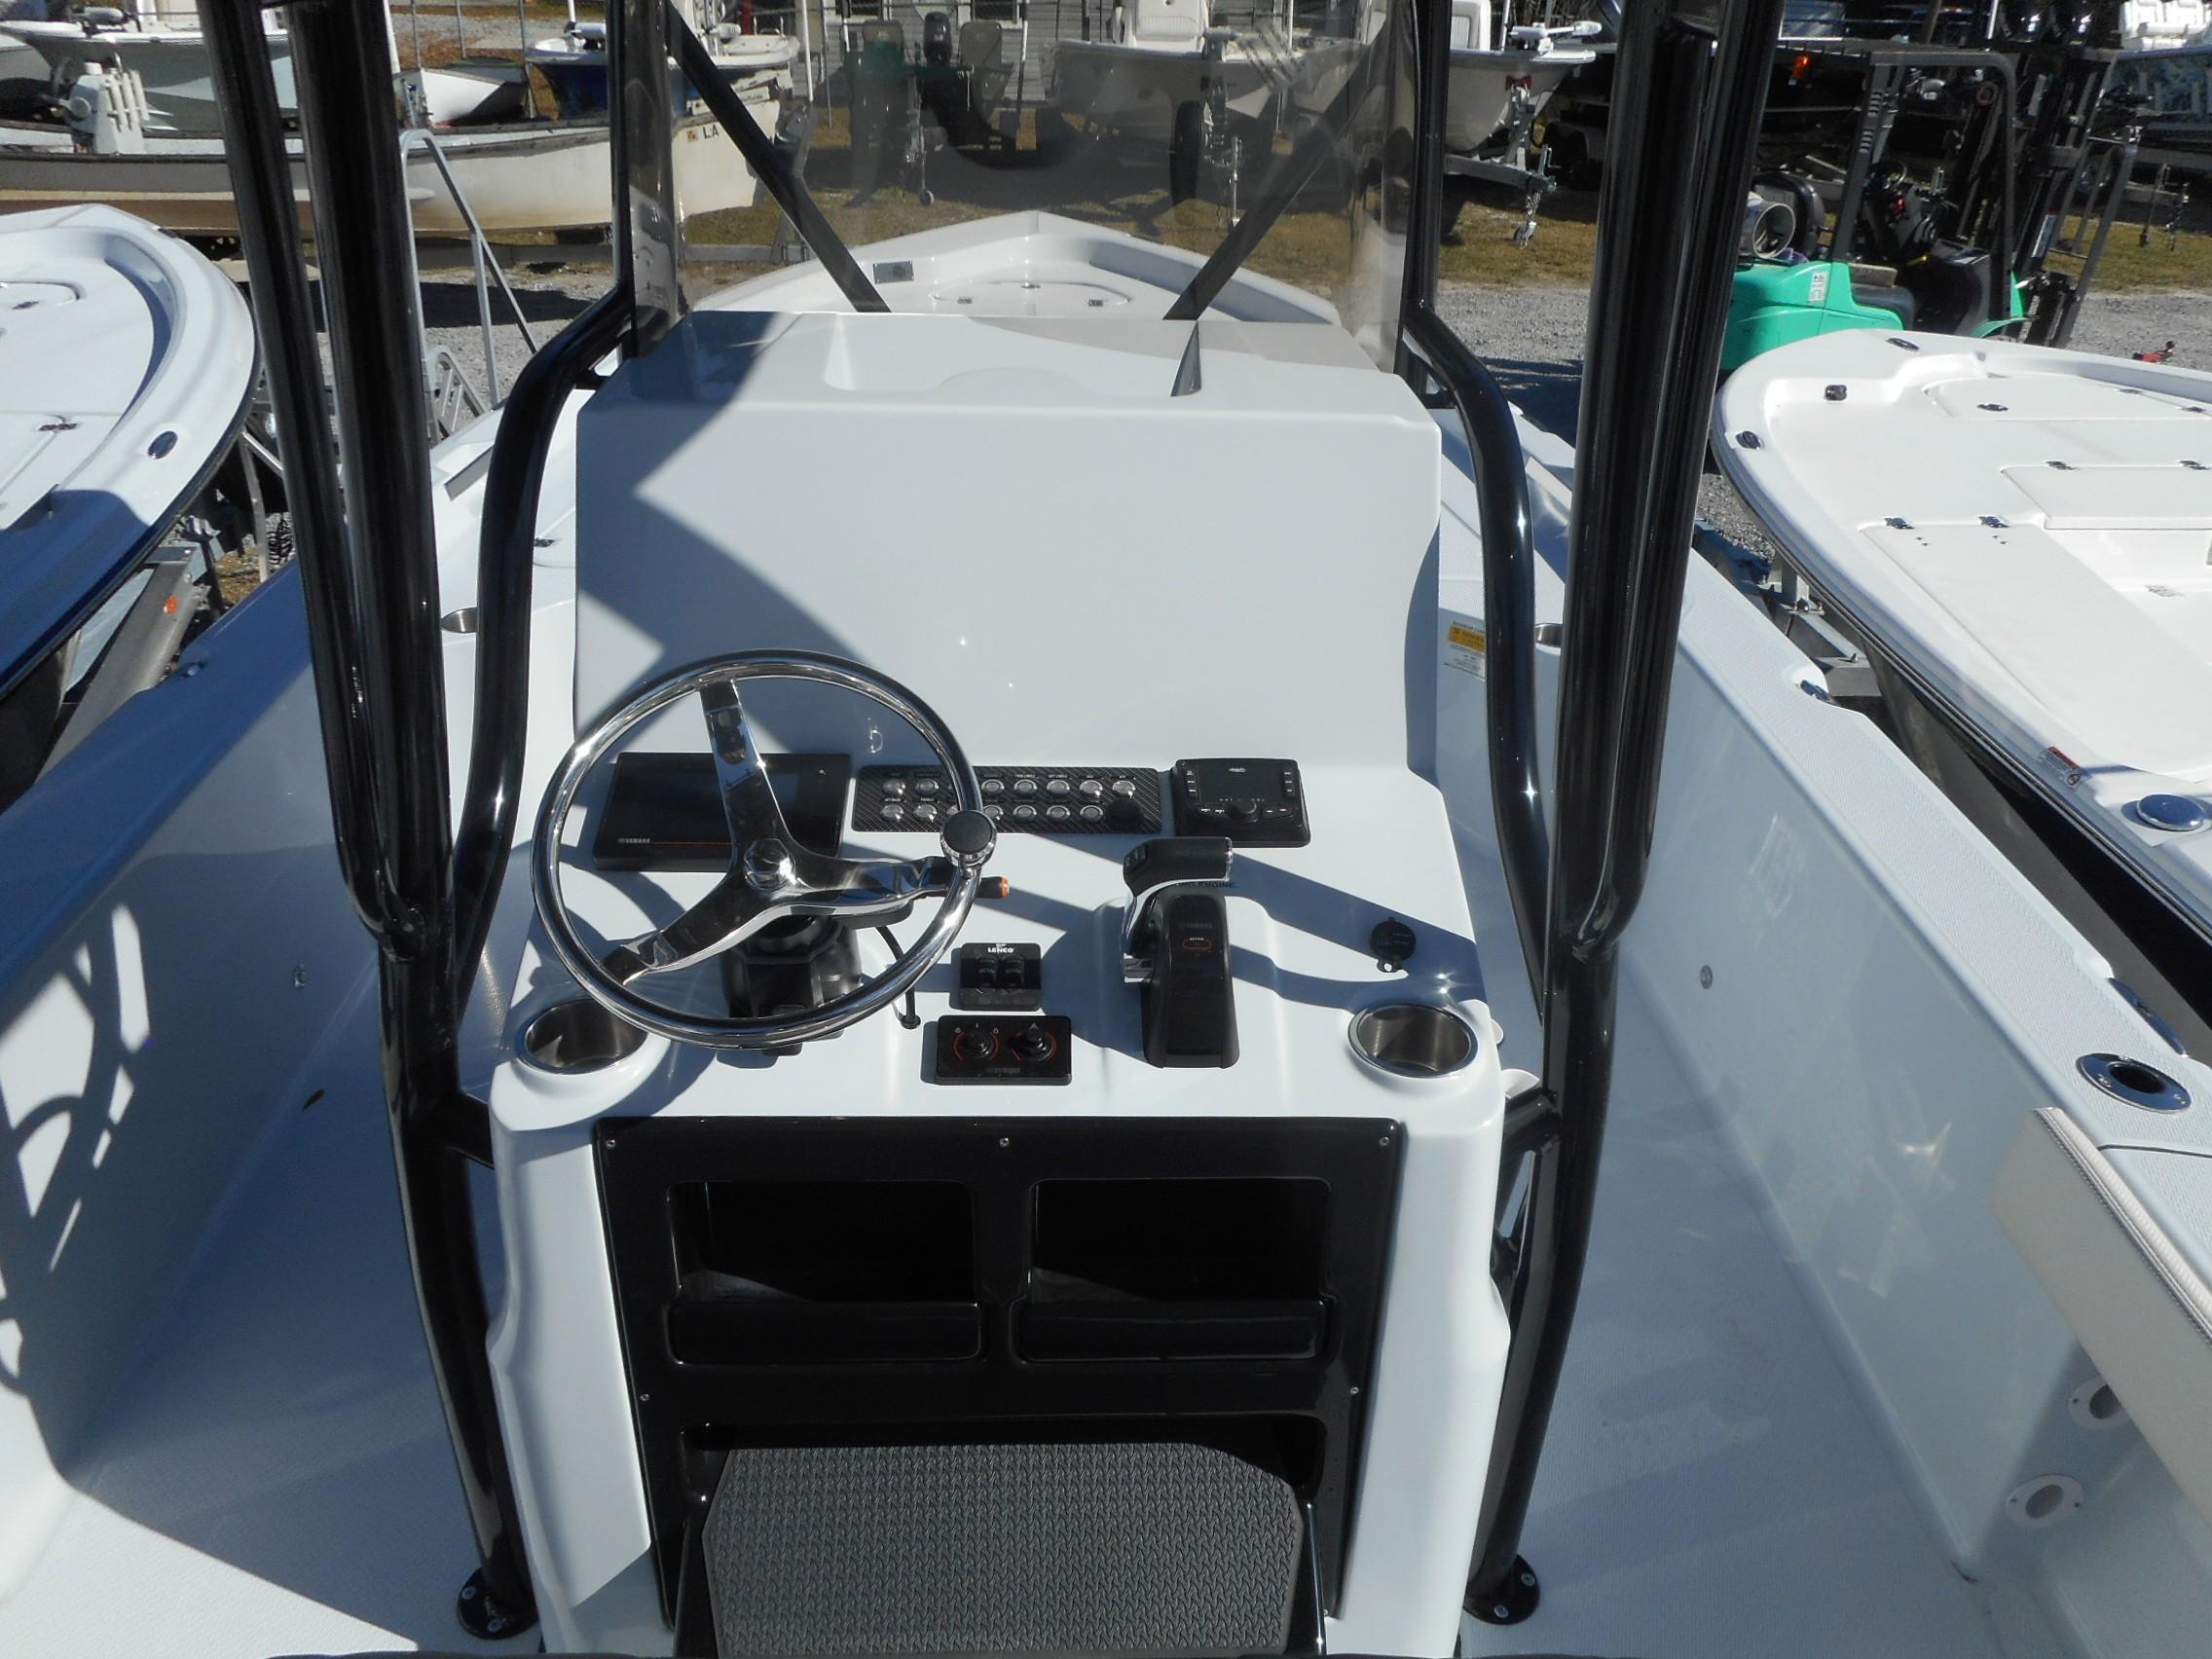 New  2020 26.2' Blue Wave 2600 Pure Bay Bay Boat in Slidell, Louisiana